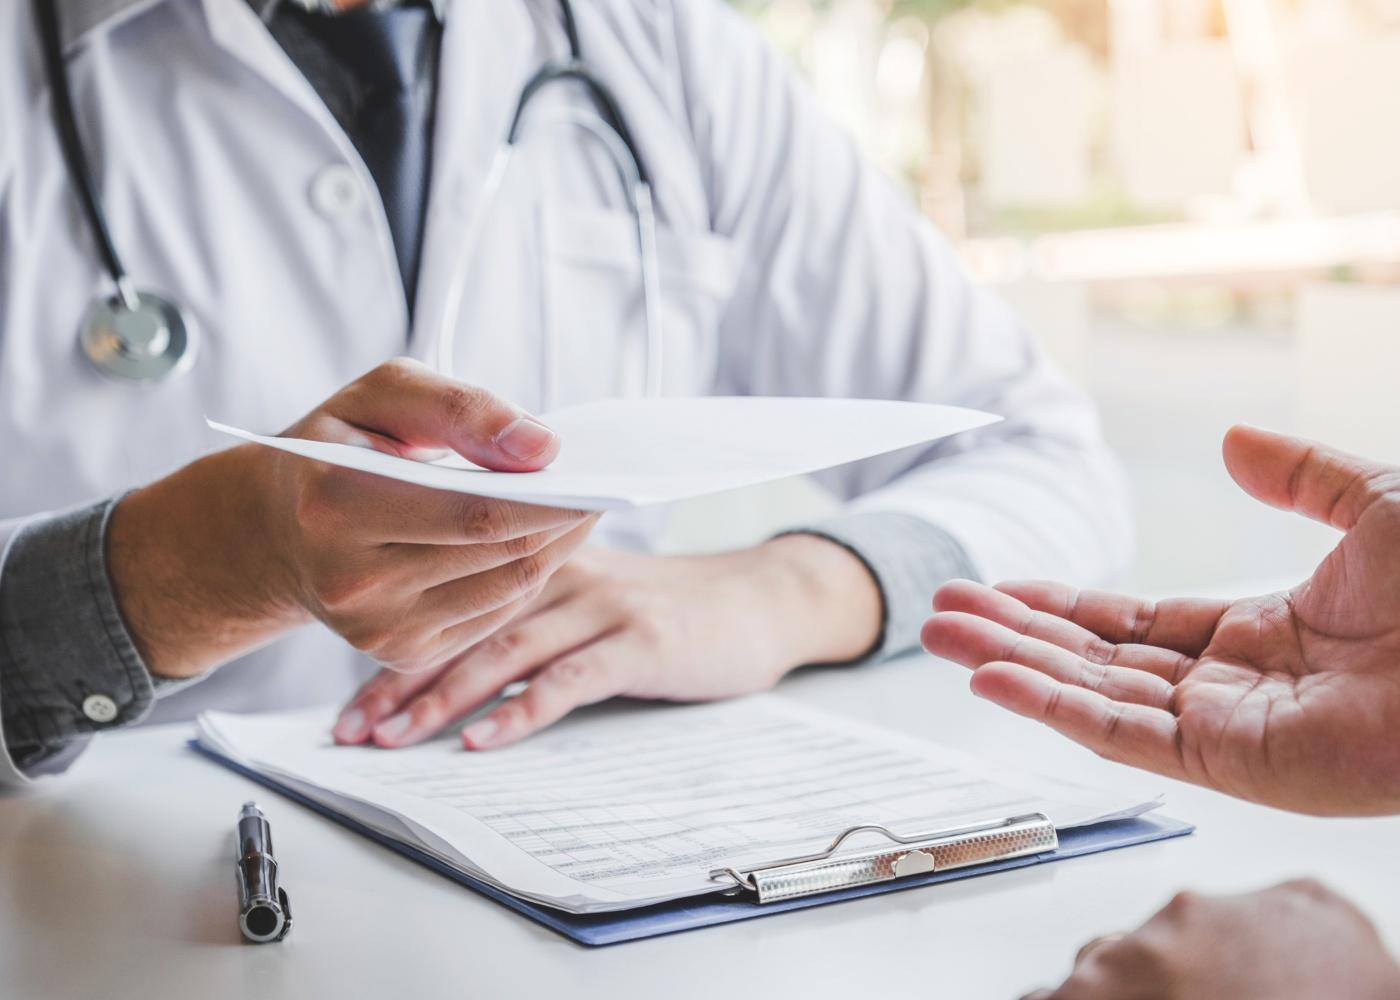 médico consulta